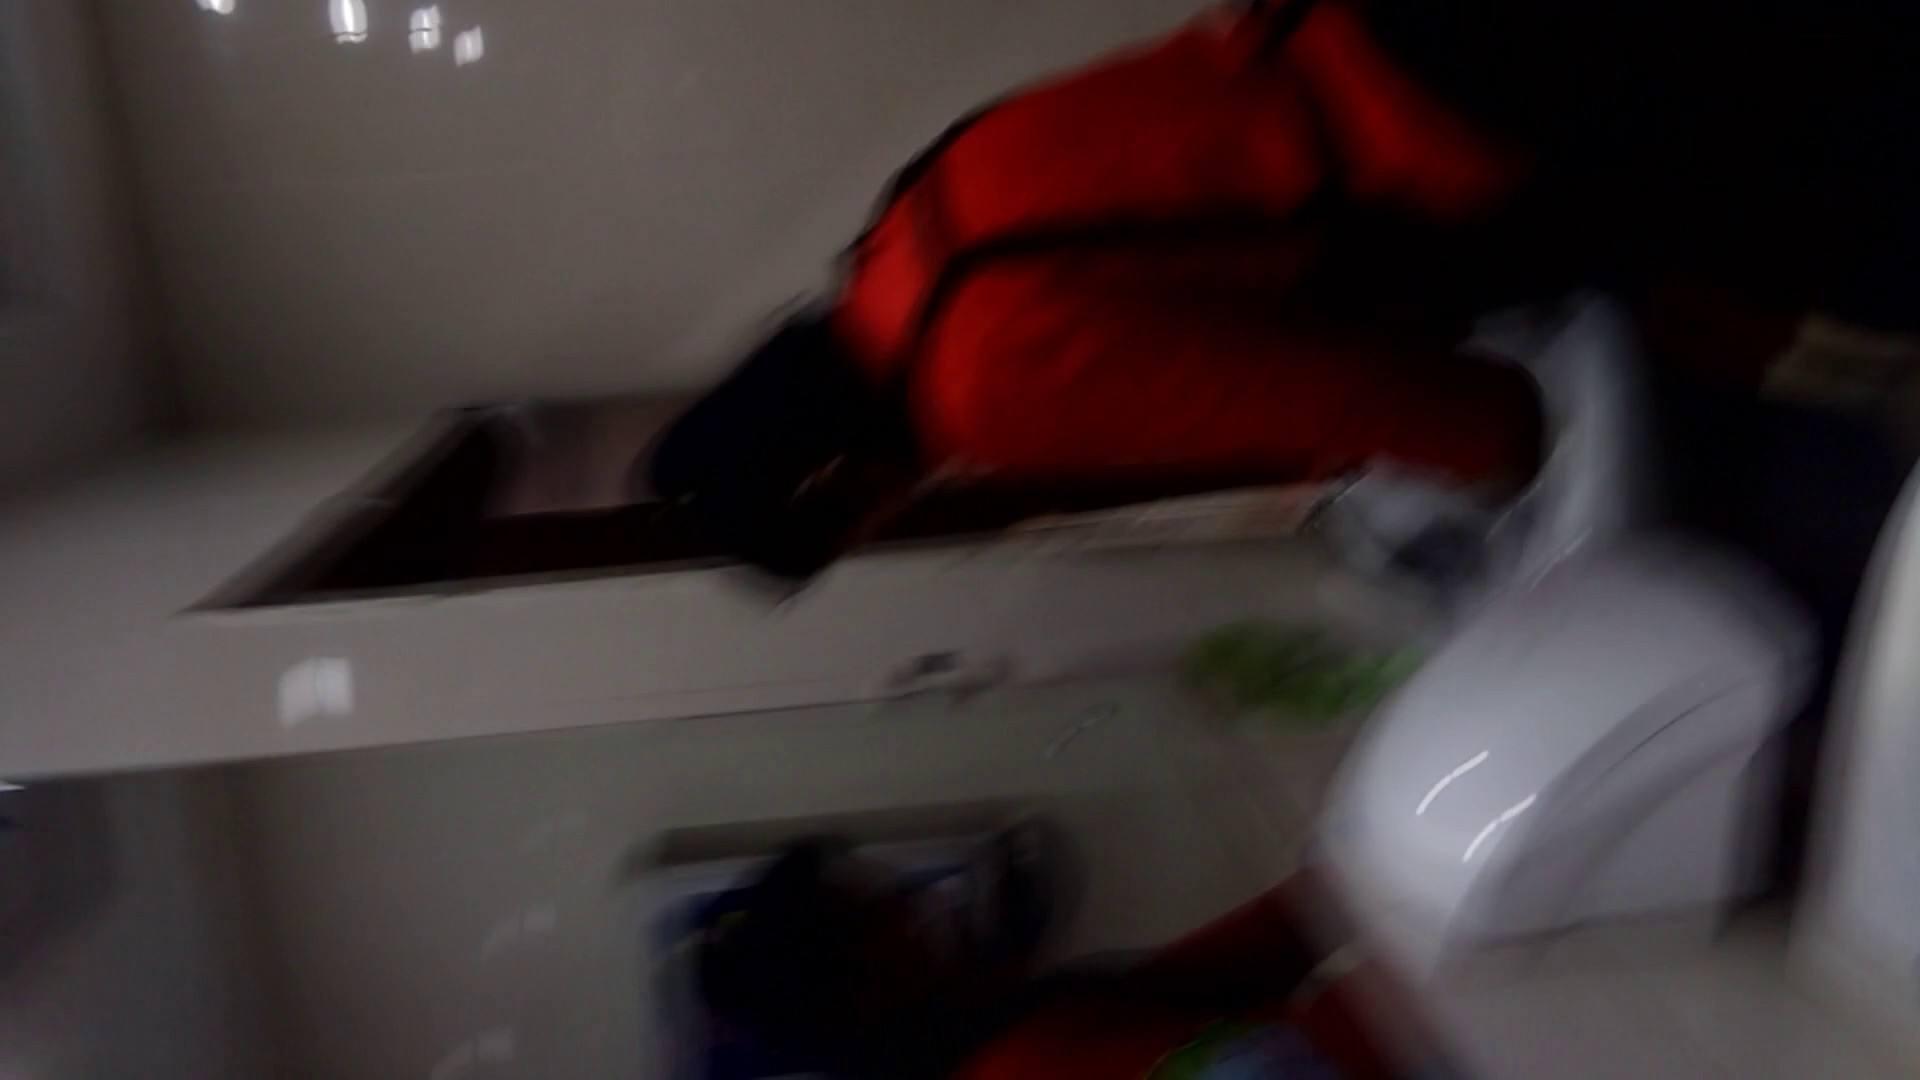 芸術大学ガチ潜入盗撮 JD盗撮 美女の洗面所の秘密 Vol.105 丸見え  100PIX 85